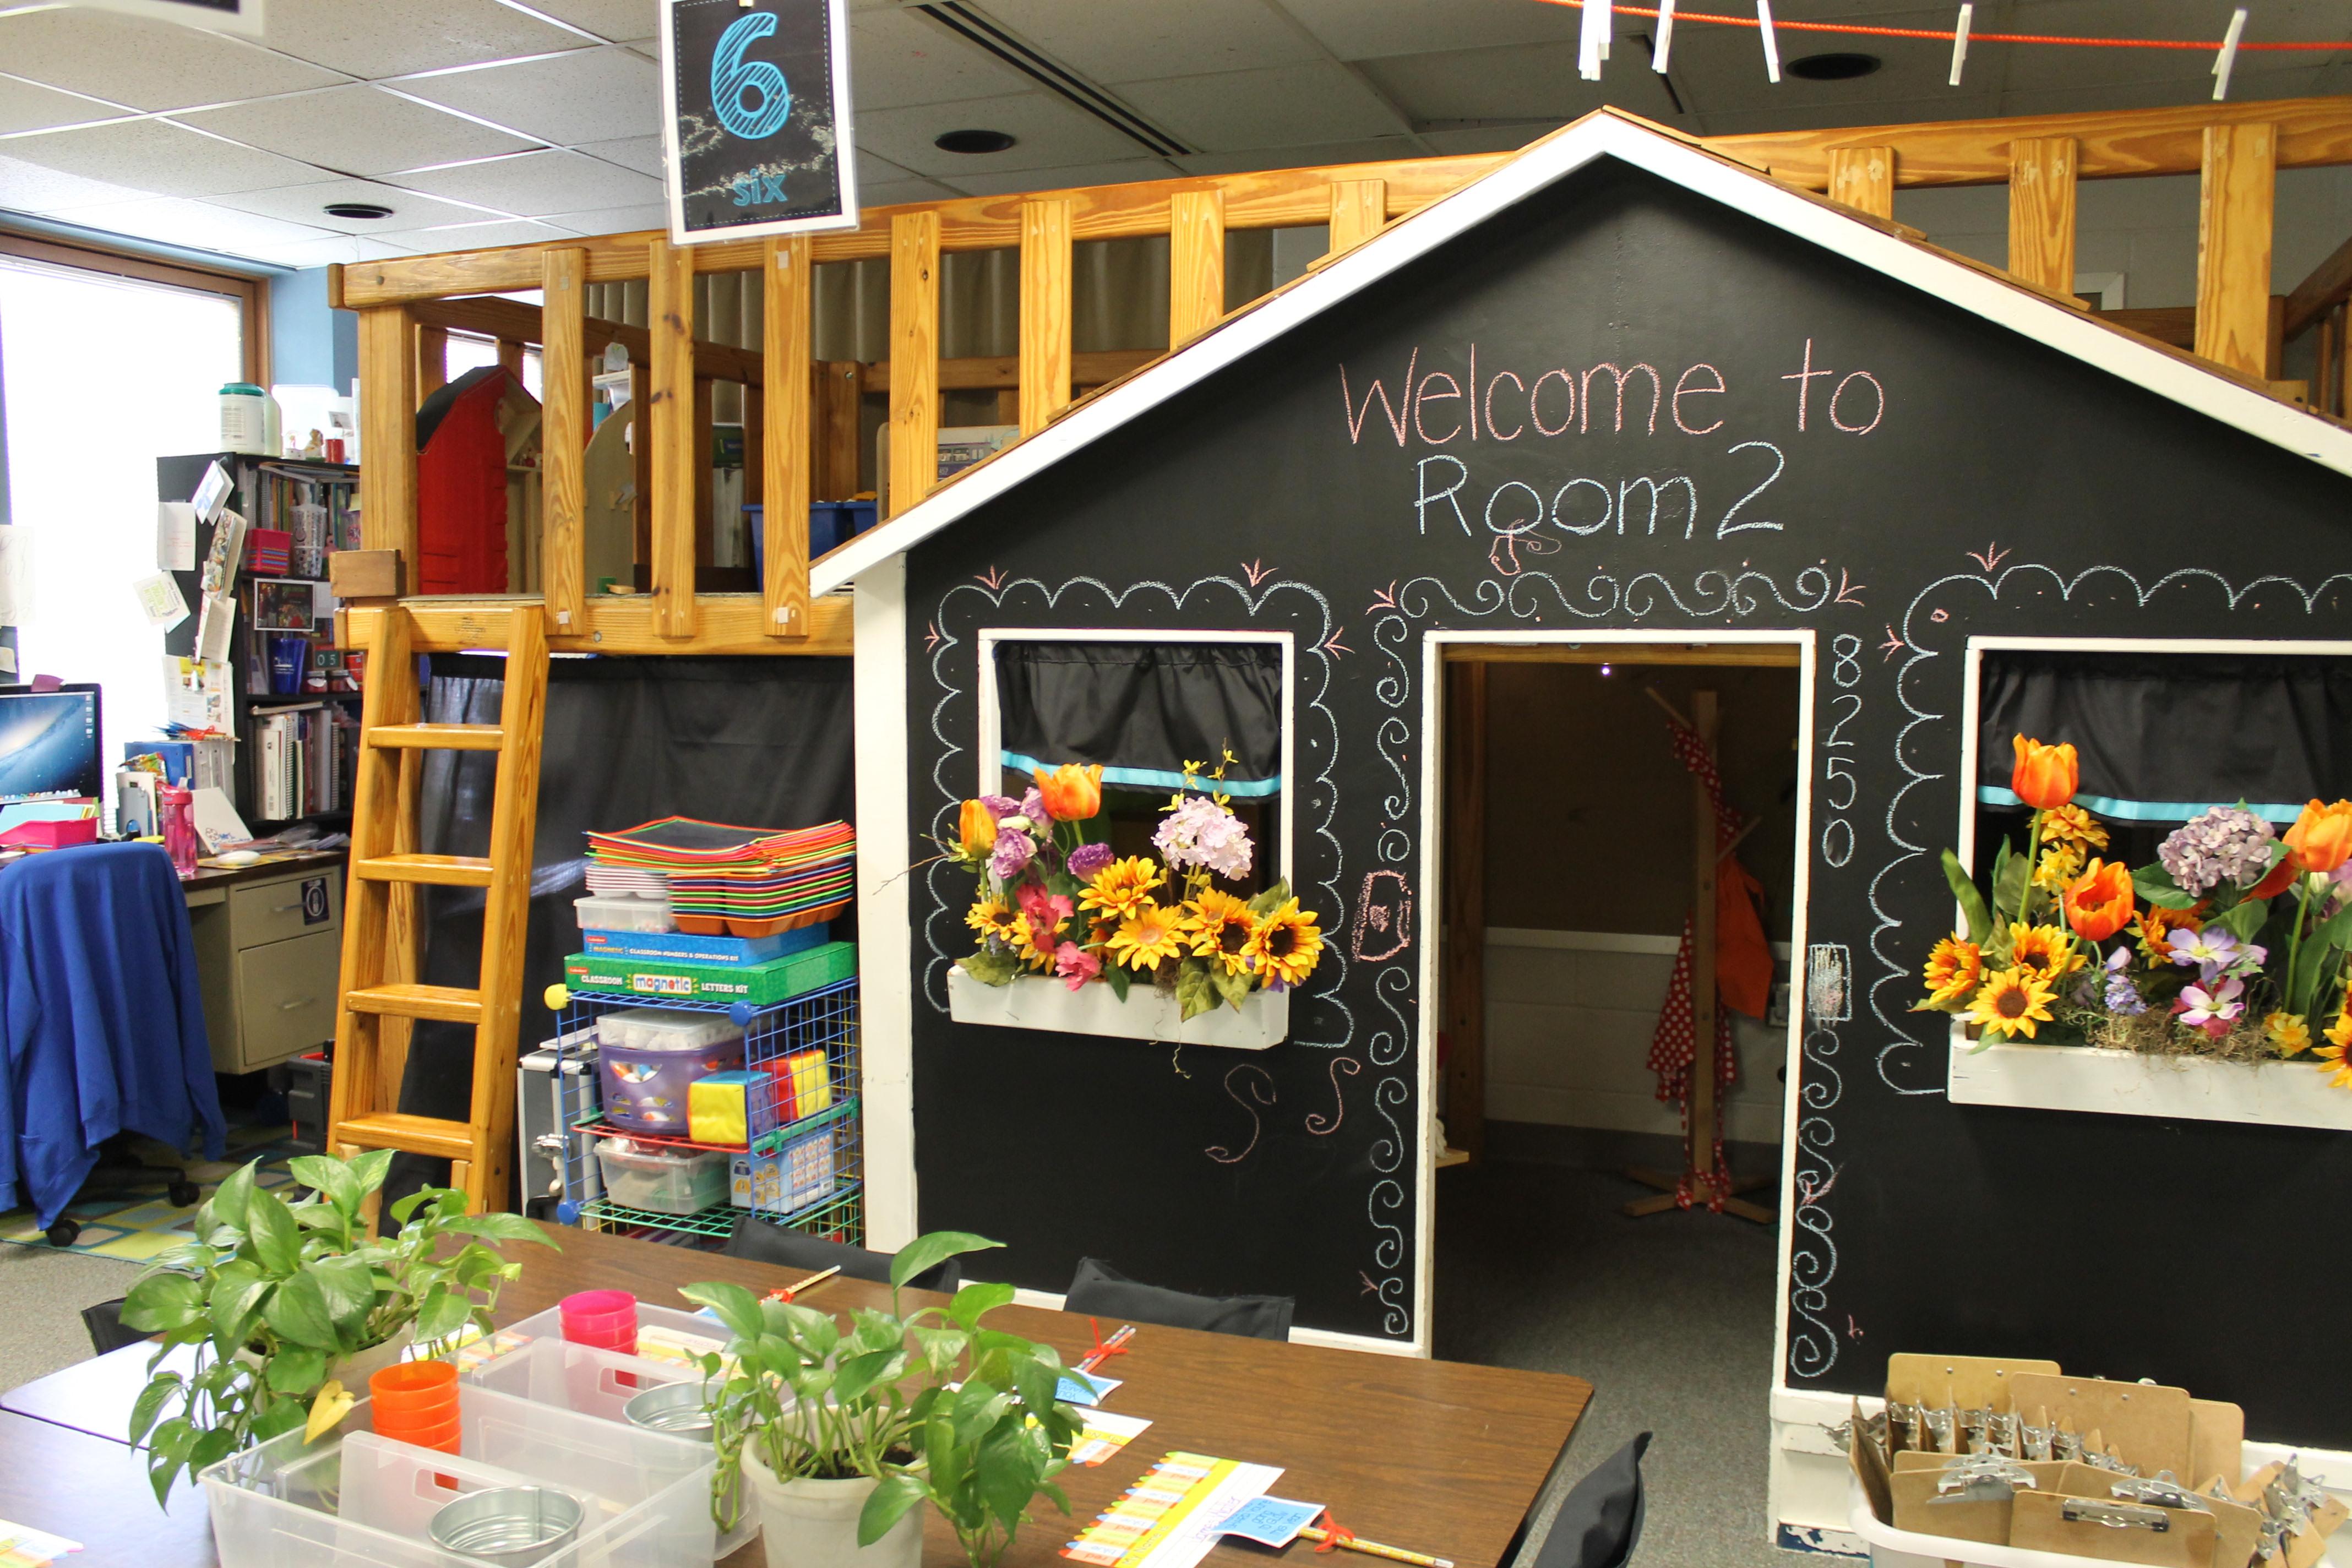 Kinder Garden: Kristen's Kindergarten